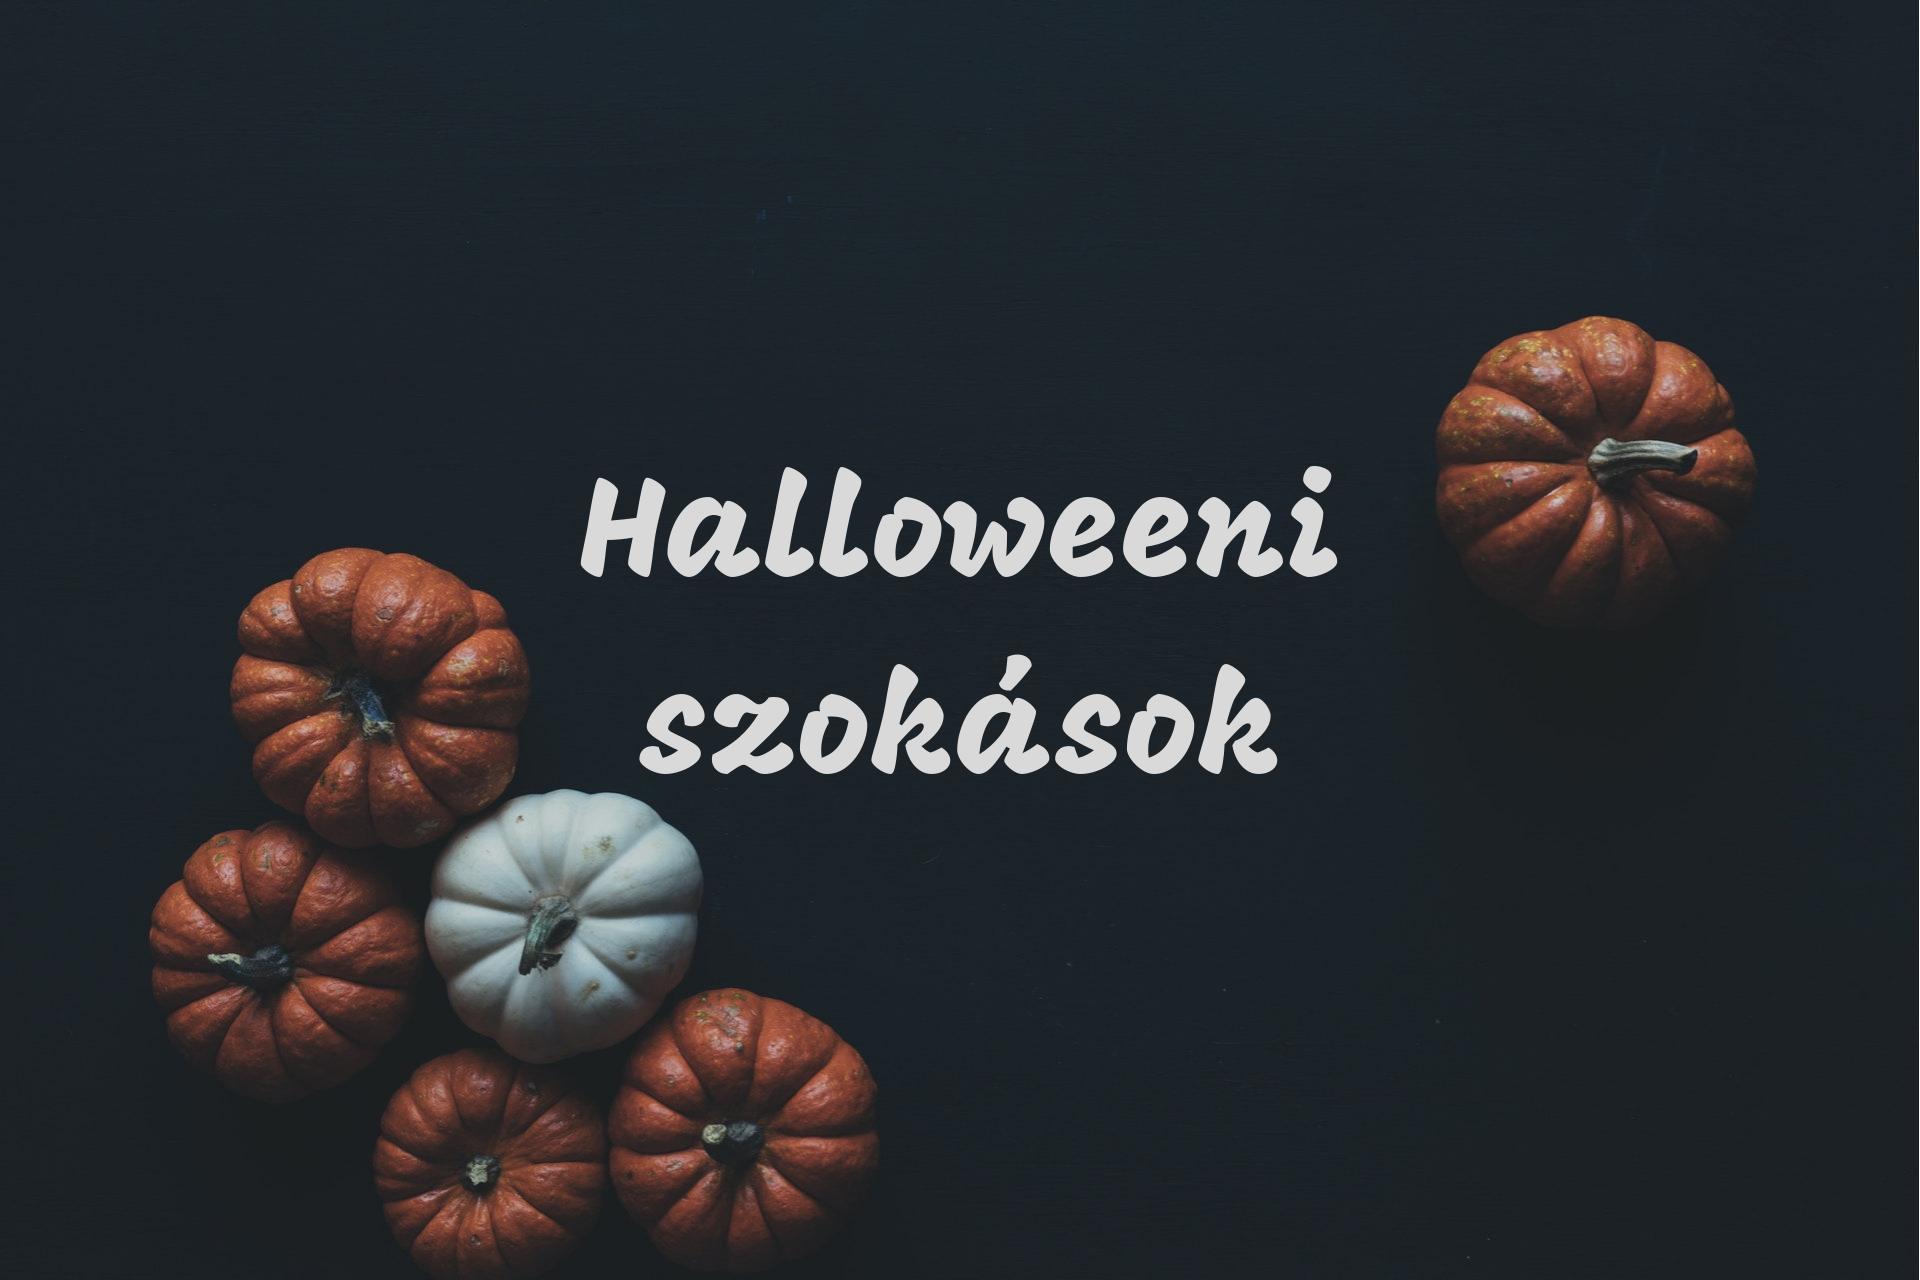 halloweeni_szokasok.png